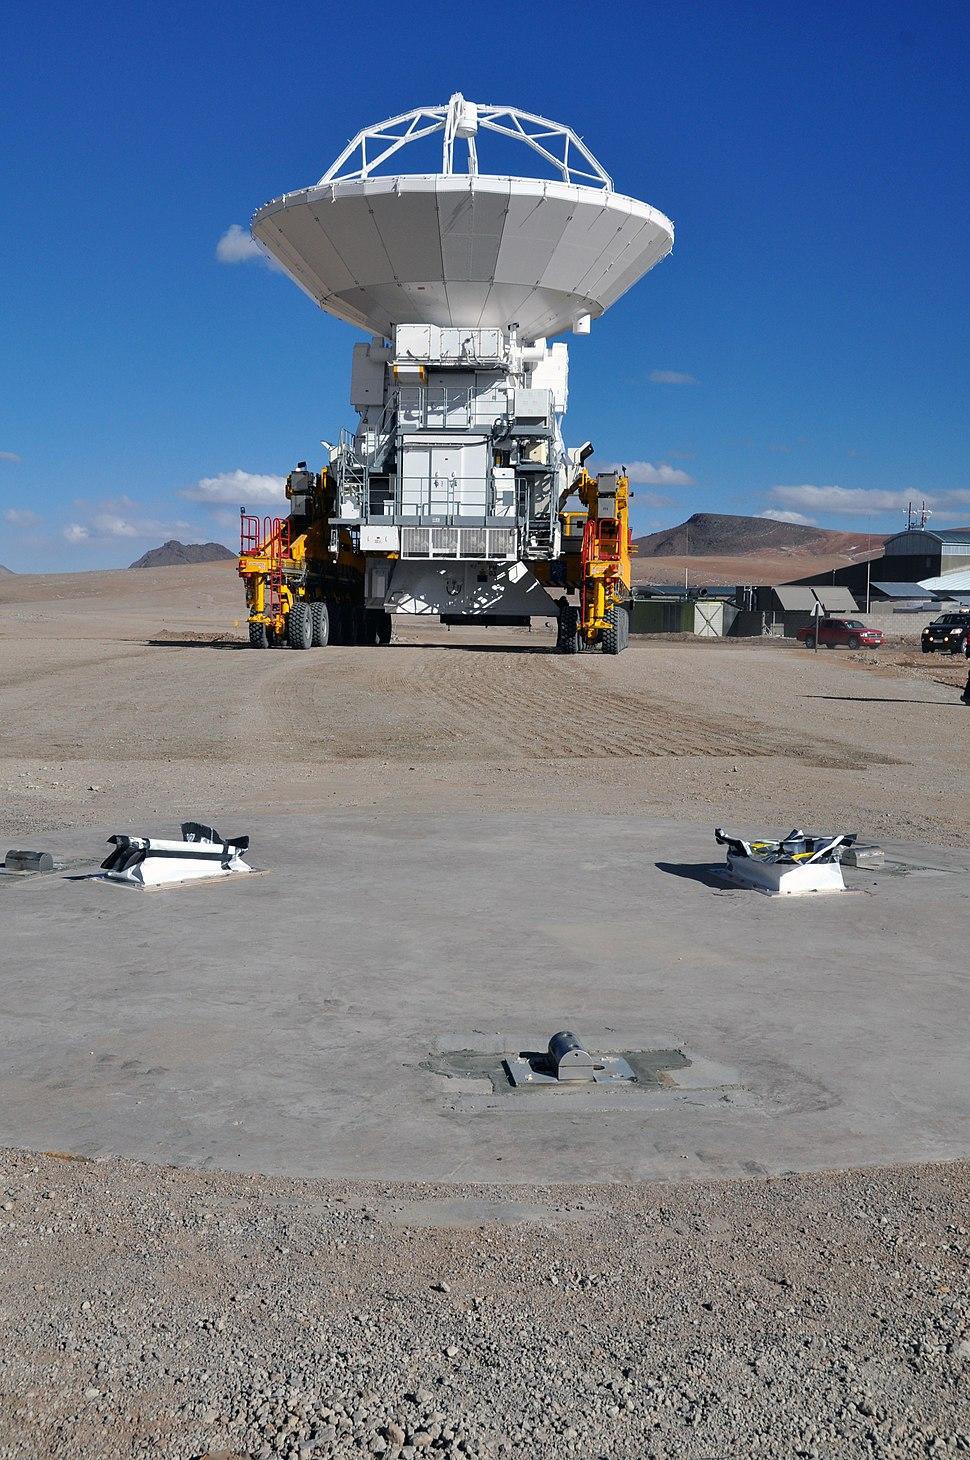 Positioning an Antenna at 5000 Metres